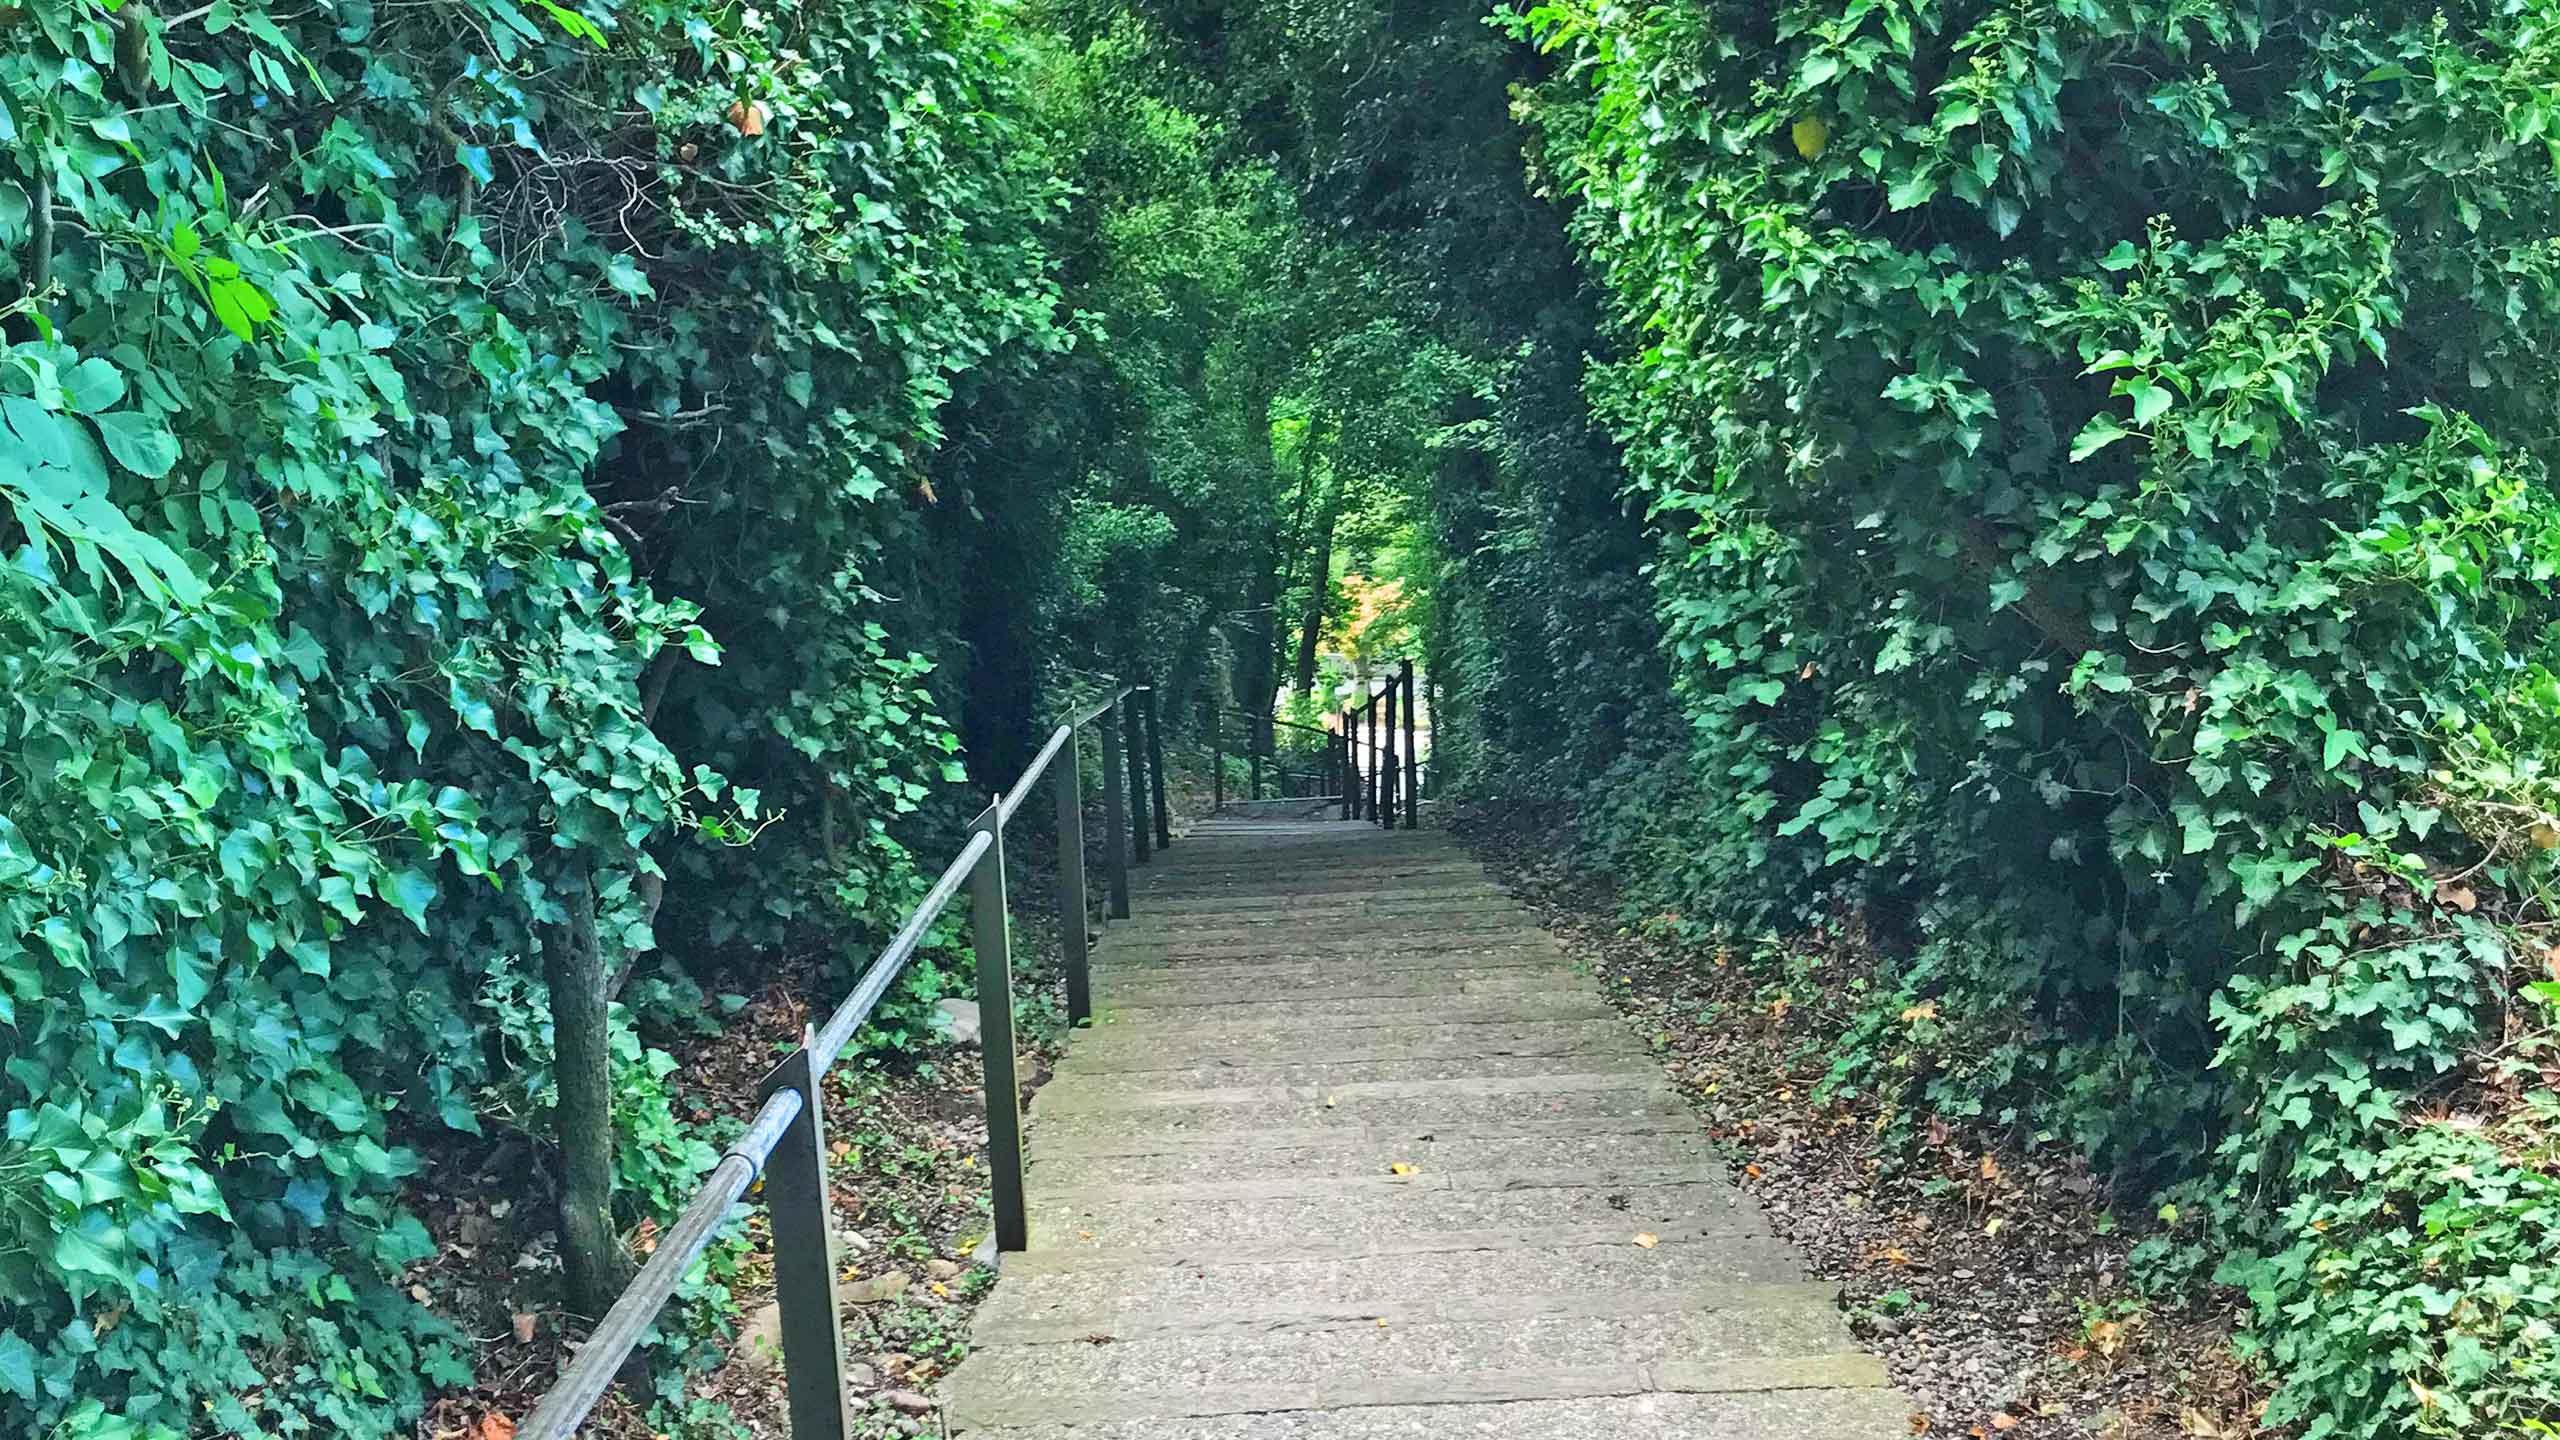 jakobshuebeli-thun-treppe-gebuesch.jpg